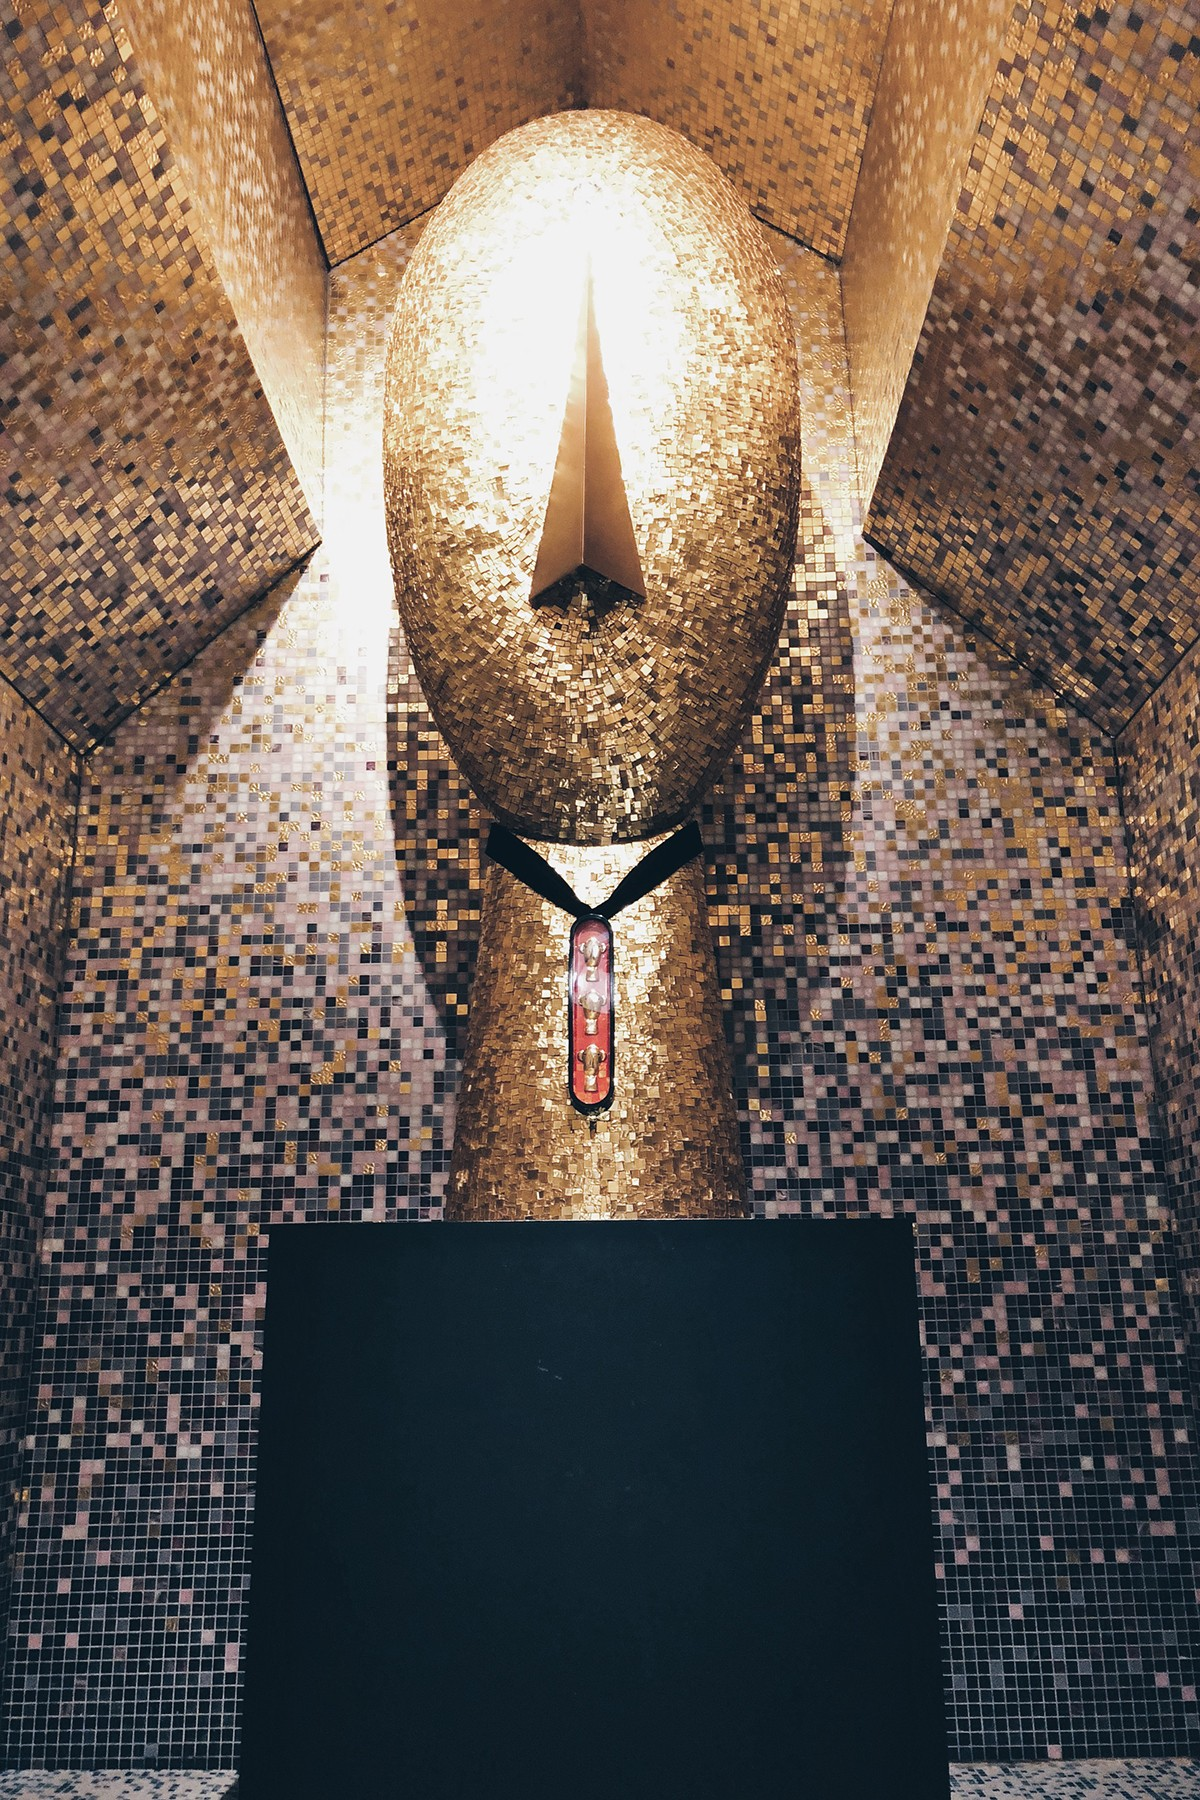 北野武、David Lynch 参上-Cartier 当代艺术基金会《A Beautiful Elsewhere》展览限定开展 -https%3A%2F%2Fhk.hypebeast.com%2Ffiles%2F2018%2F06%2Ffondation-cartier-pour-lart-contemporain-shanghai-a-beautiful-elsewhere-21